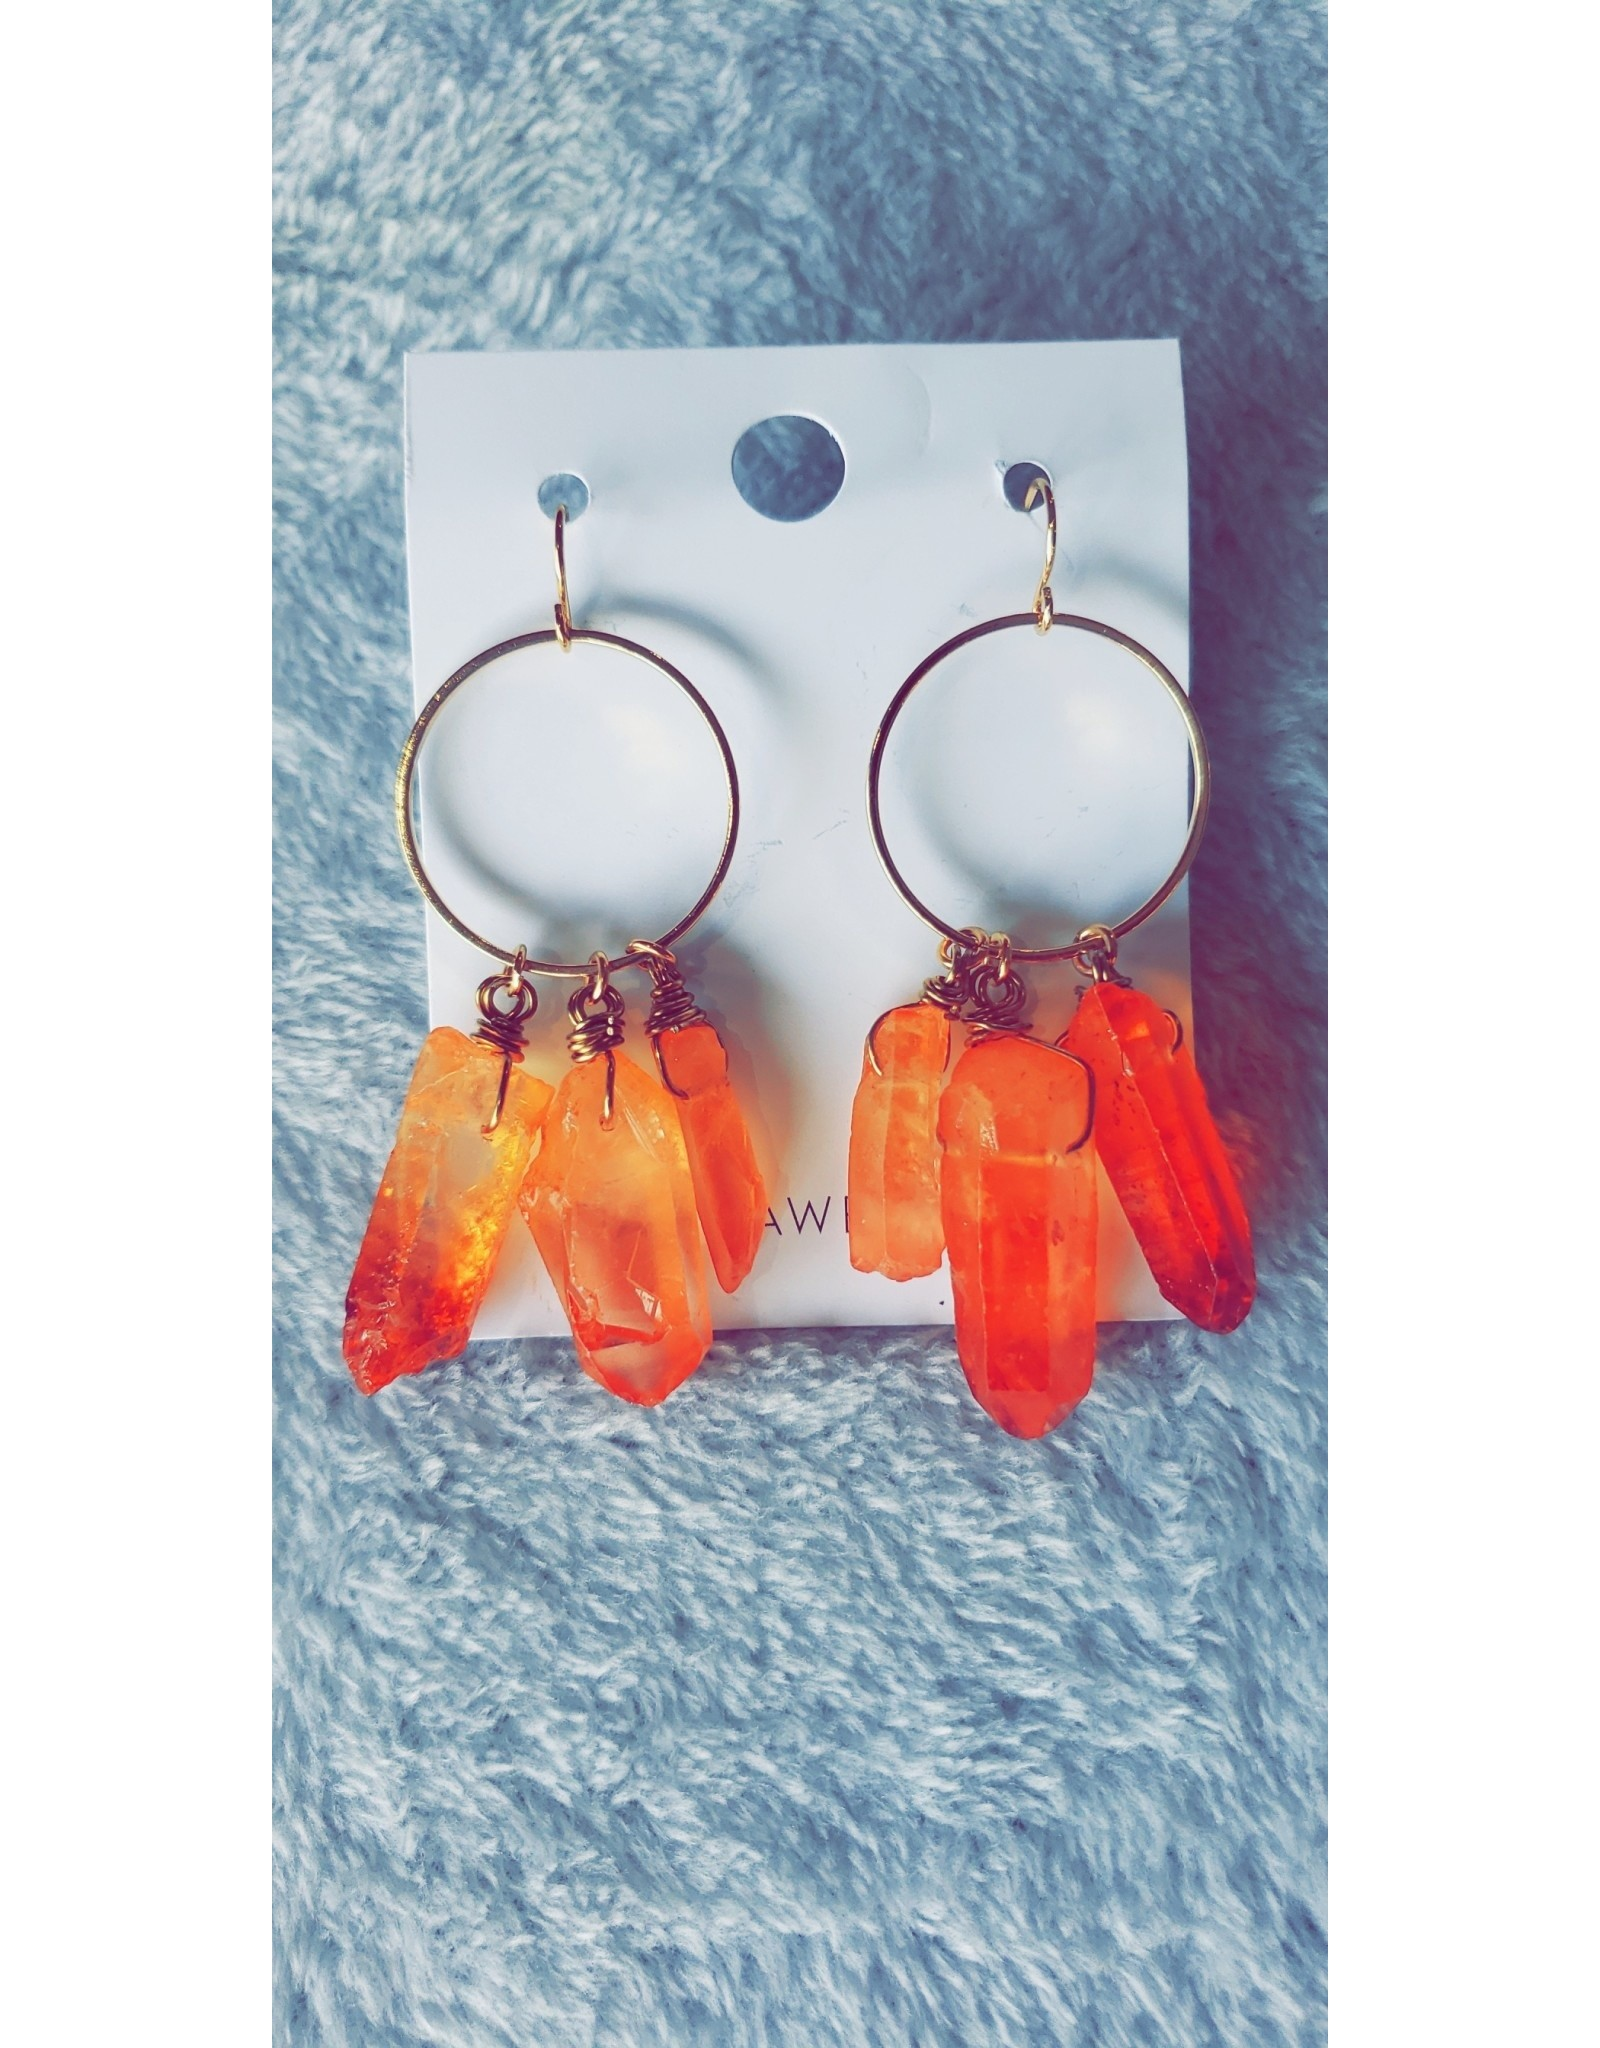 Dani Awesome Quartz Cluster Earrings - Fire